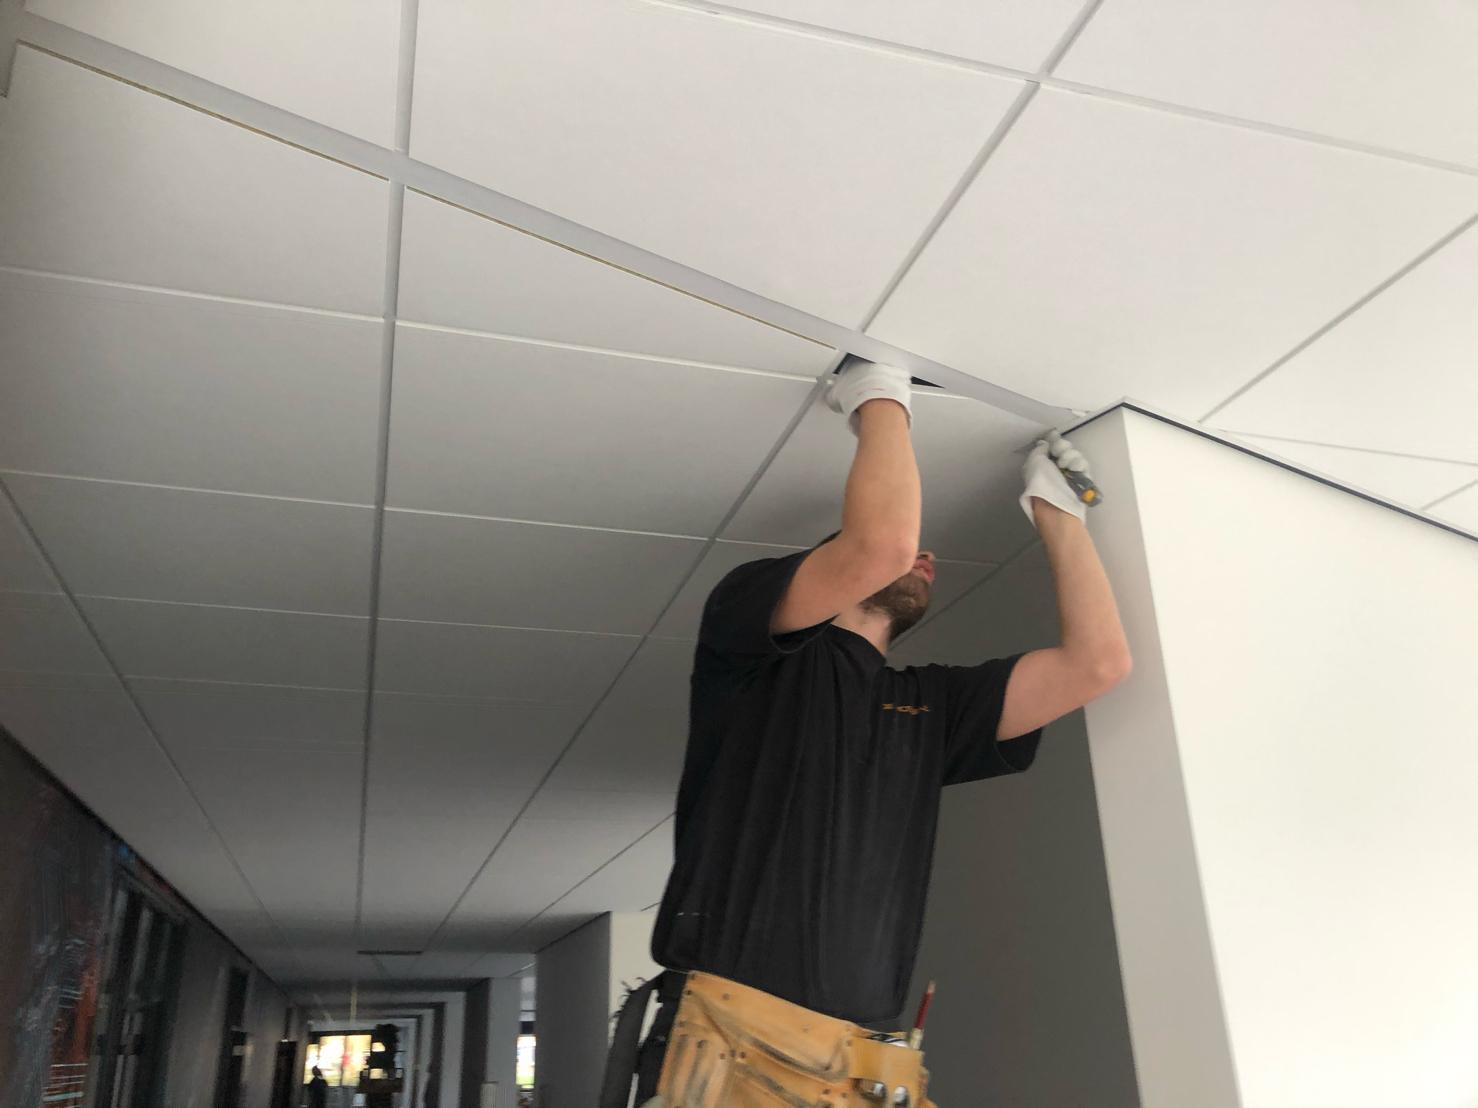 akoestiek verbeteren nick wat is akoestisch plafond systeemplafond wit inleg systeemplafondplaten panelen